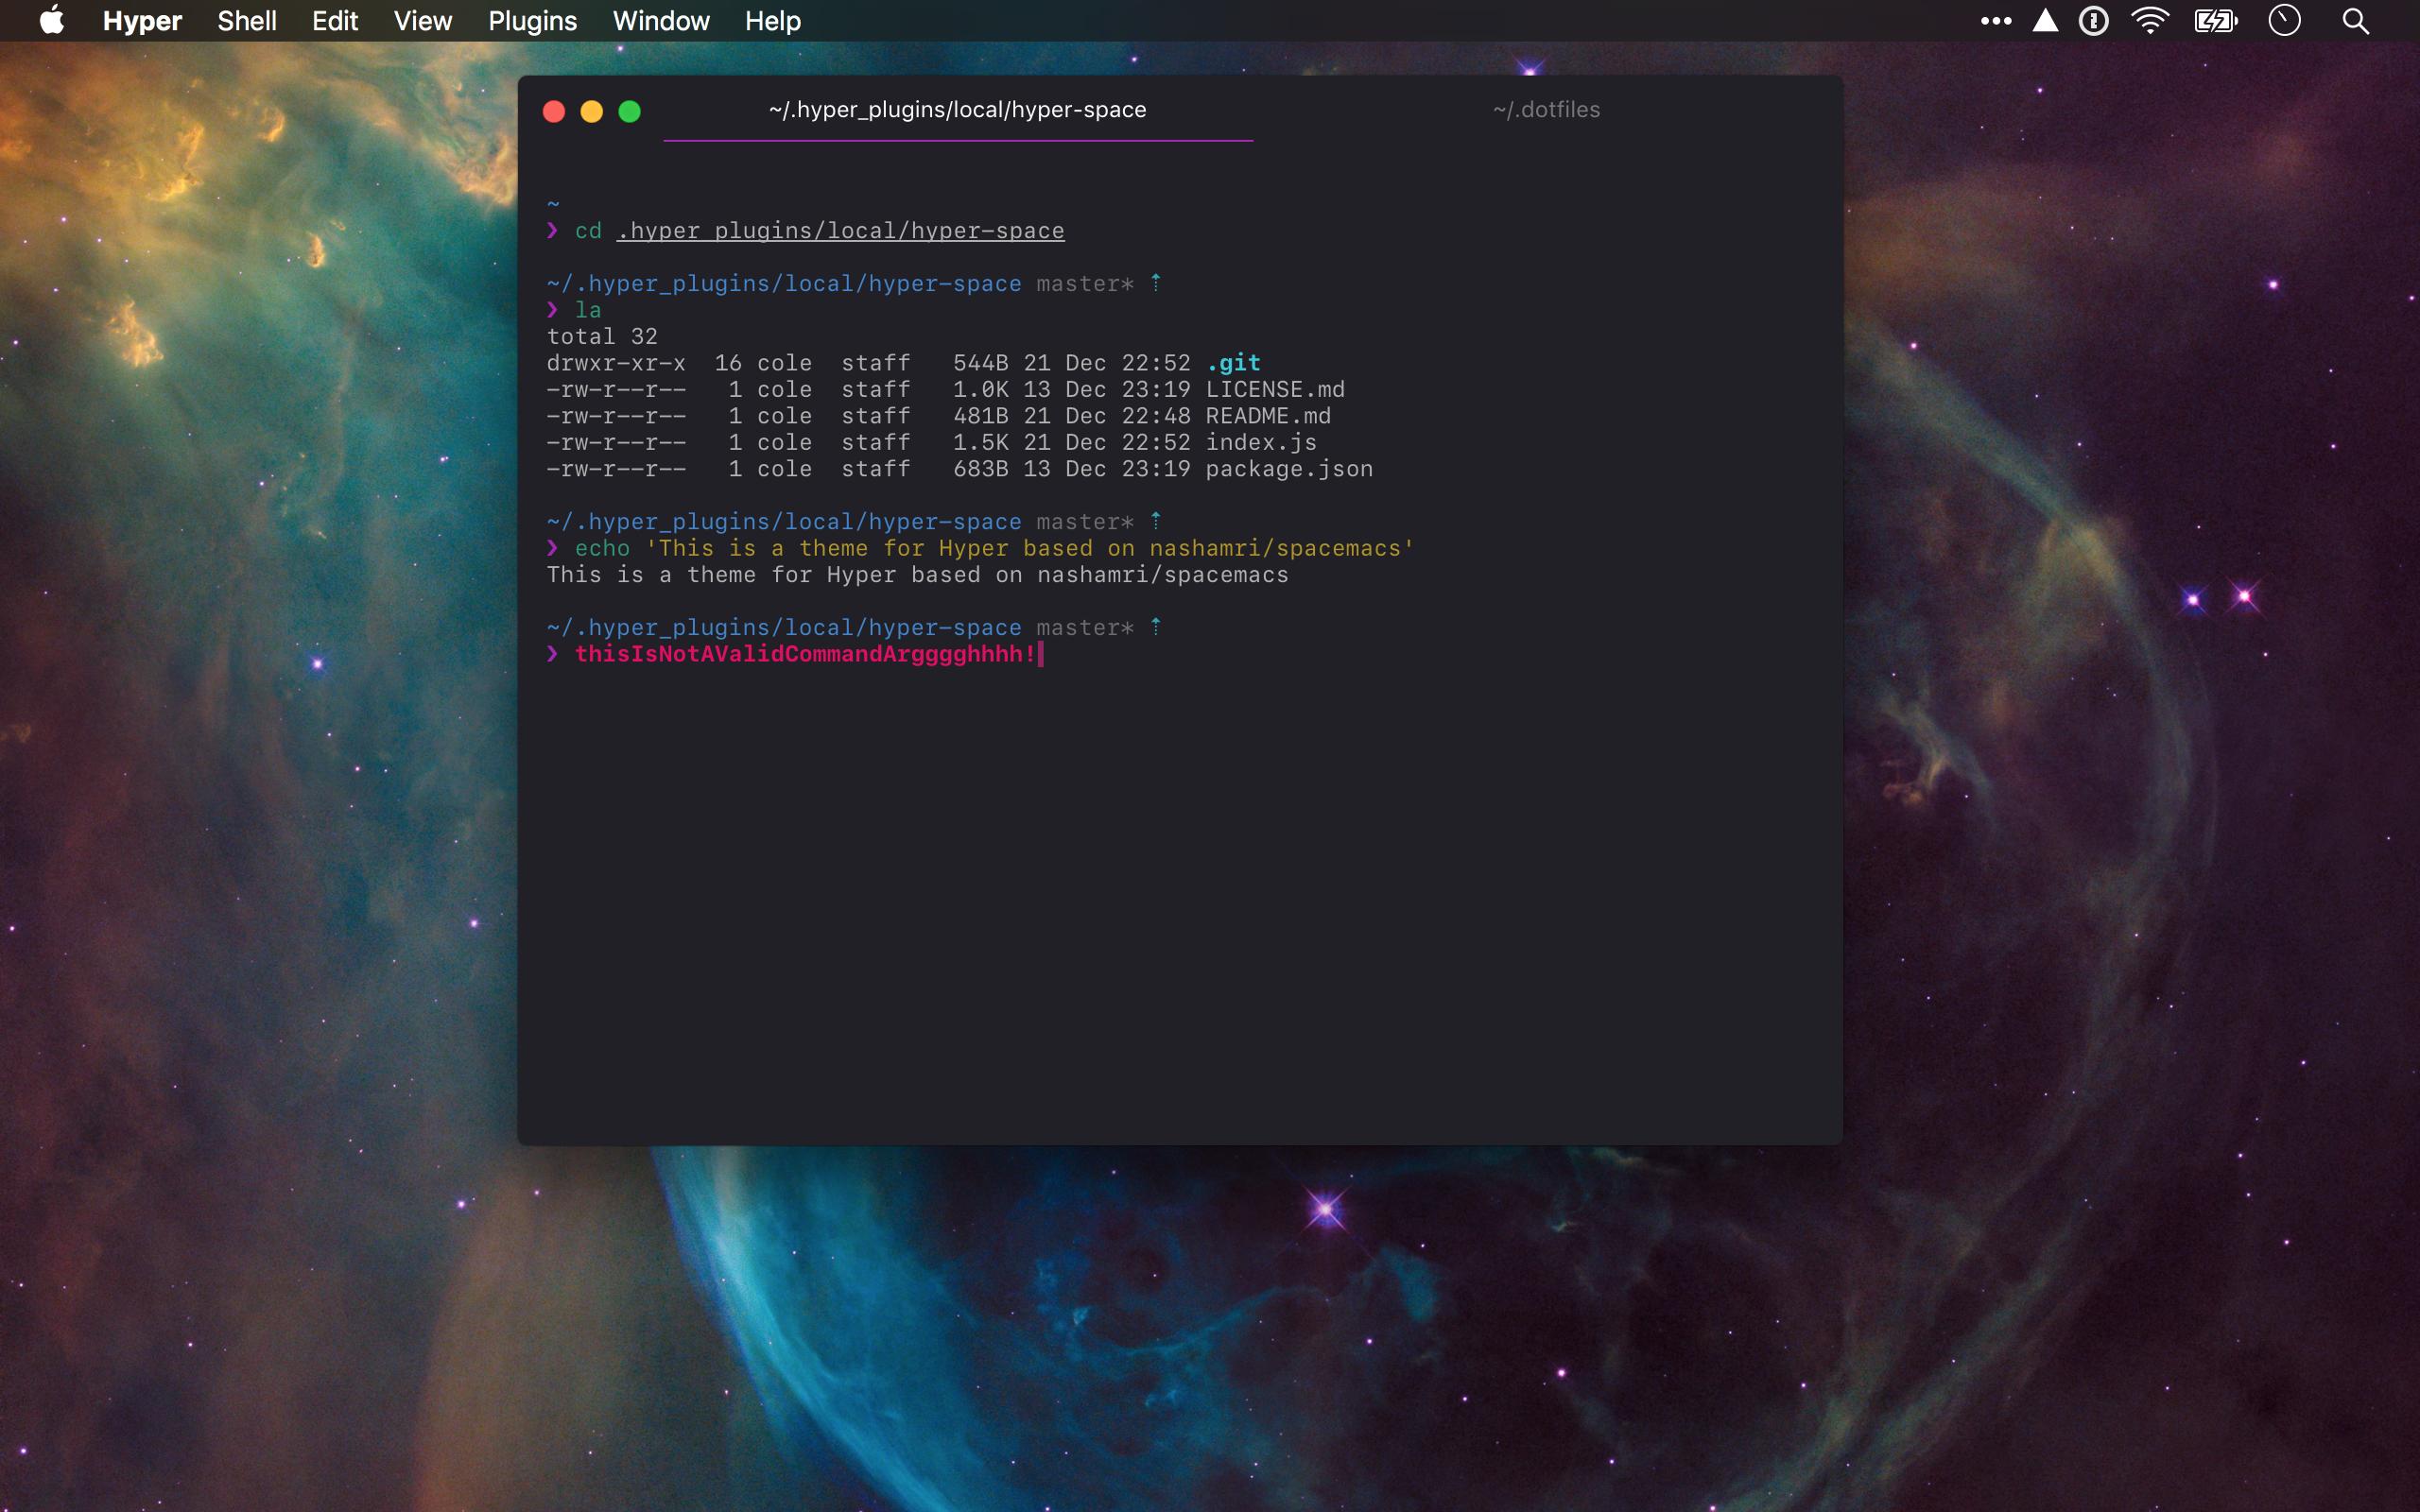 A preview of the hyper-space colour scheme